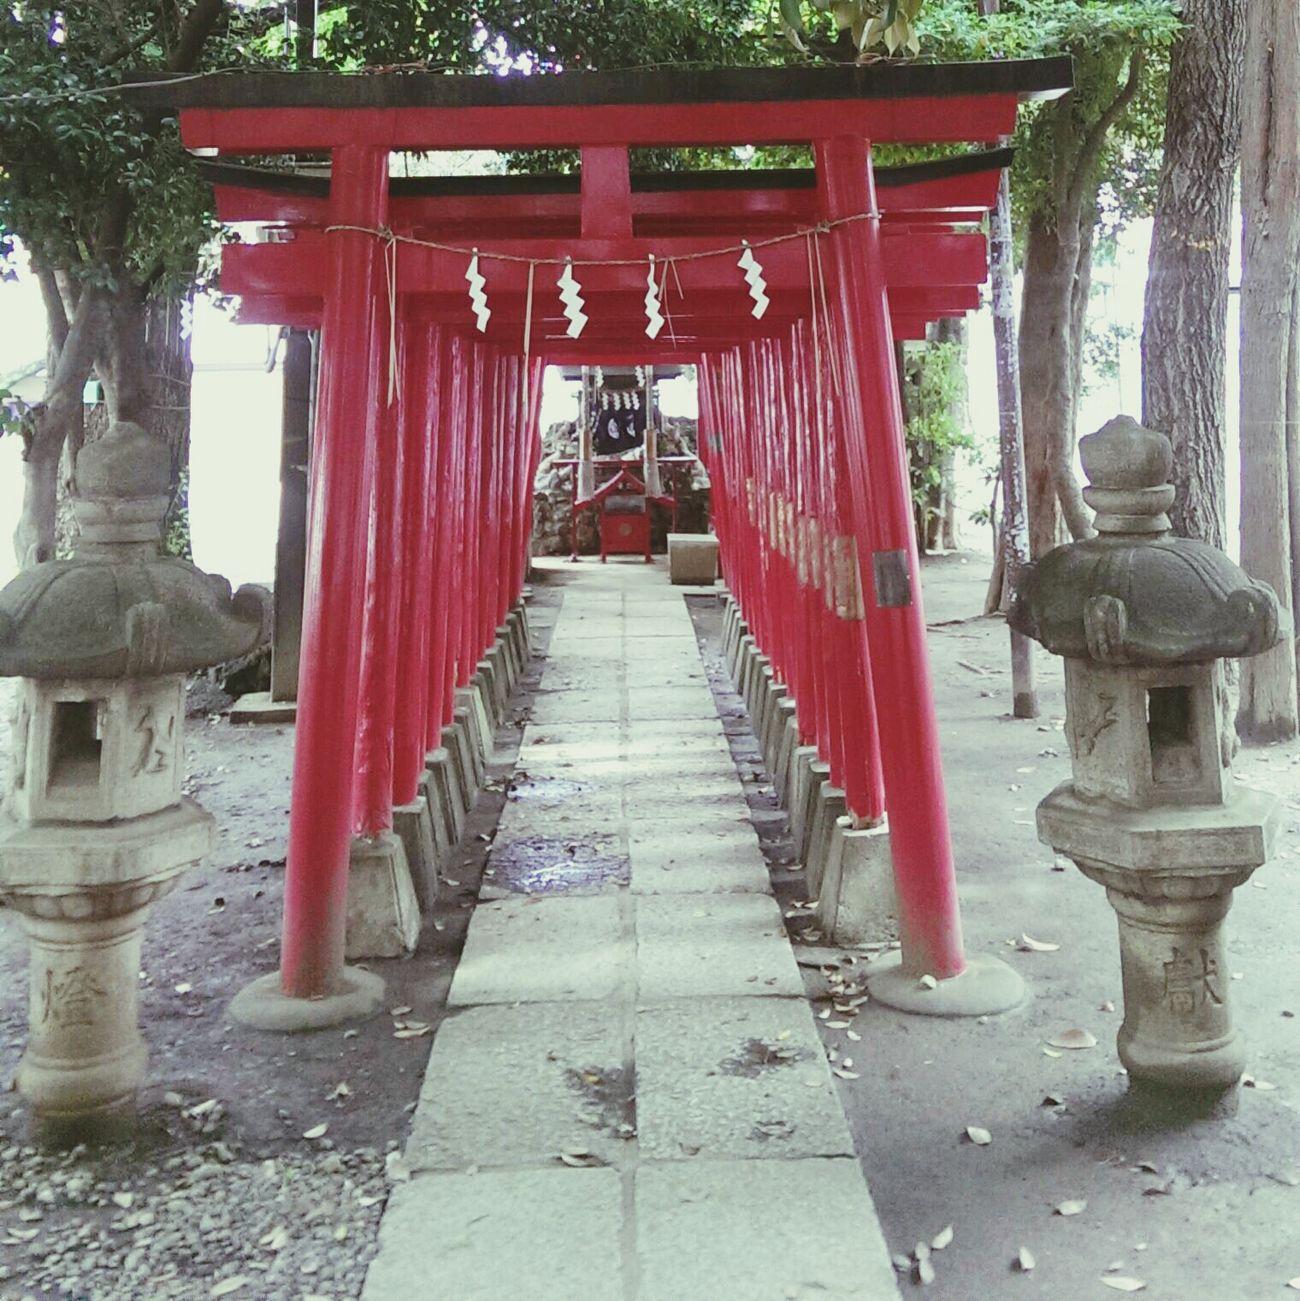 花園神社 EyeEm Japan Photo Shinjuku Tokyo Japan 花園神社 Travel Photography